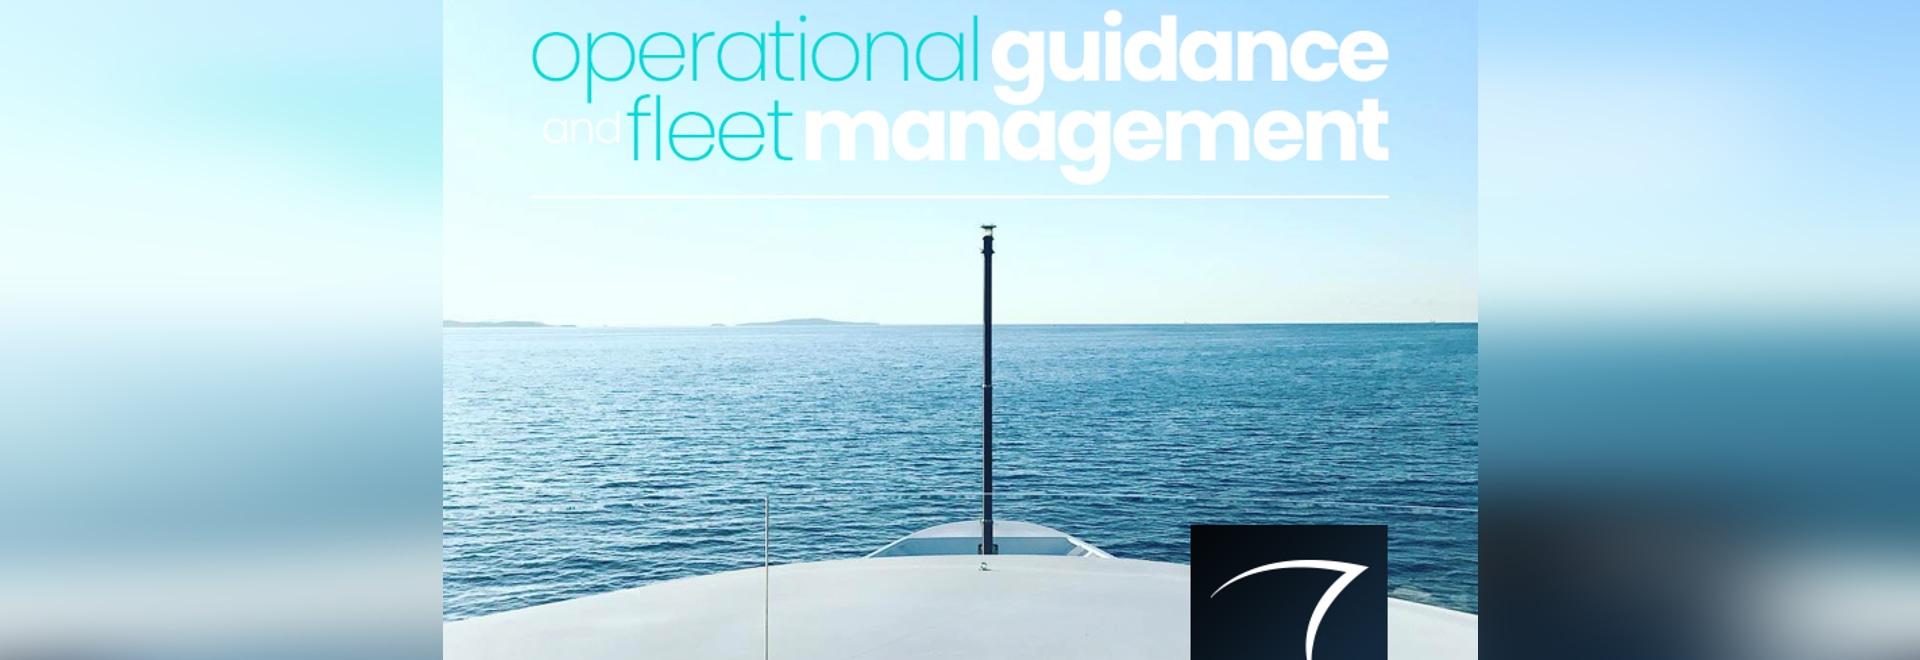 Hefring Marine Operational Guidance and Fleet Management